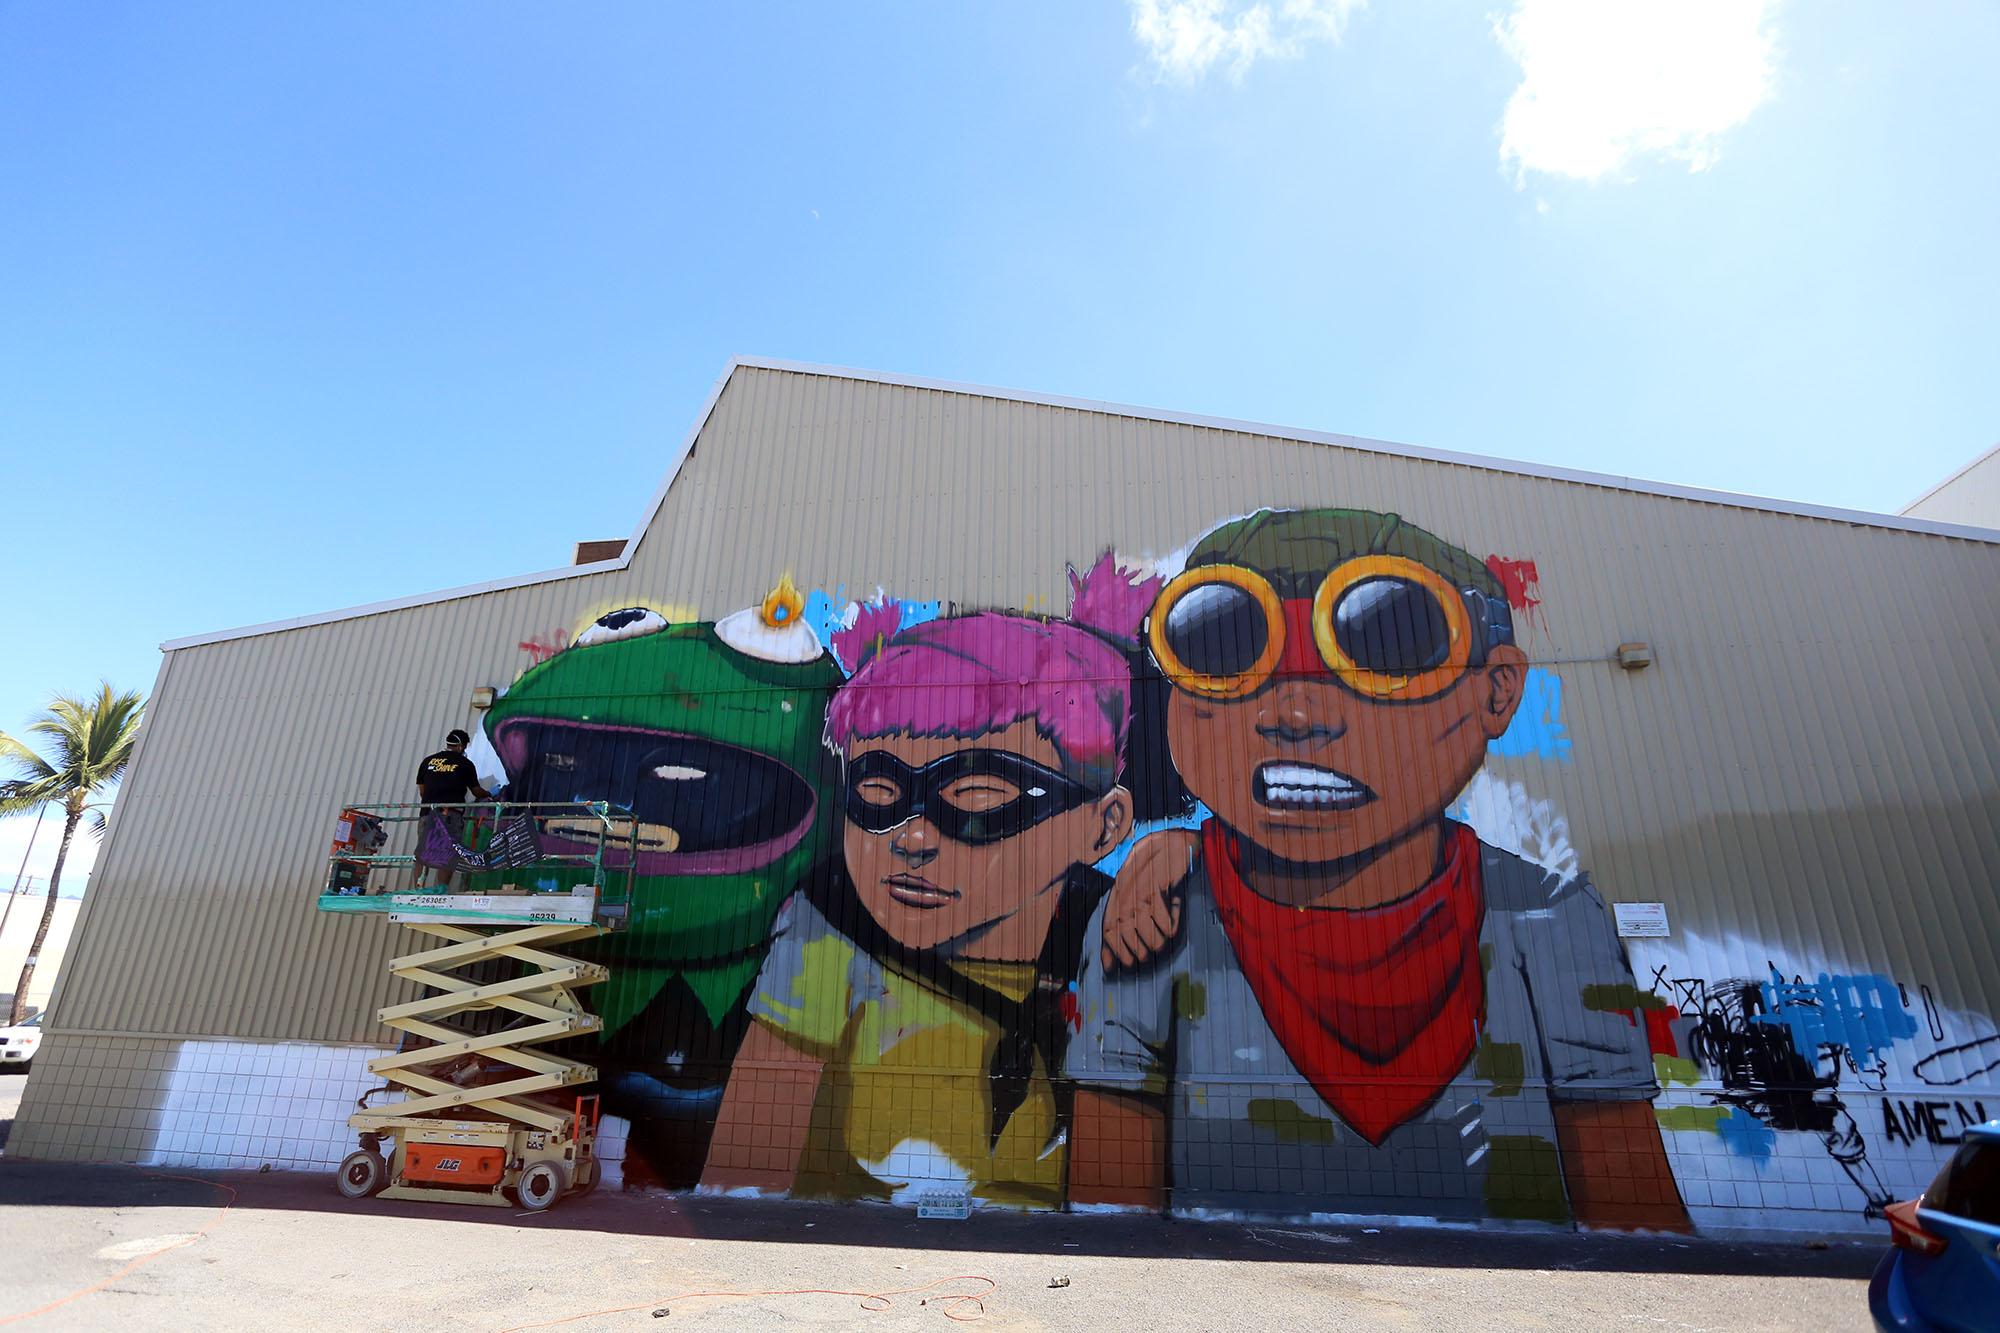 pow wow 2016 hawaii hebru brantley grafite mural dionisio arte (3)